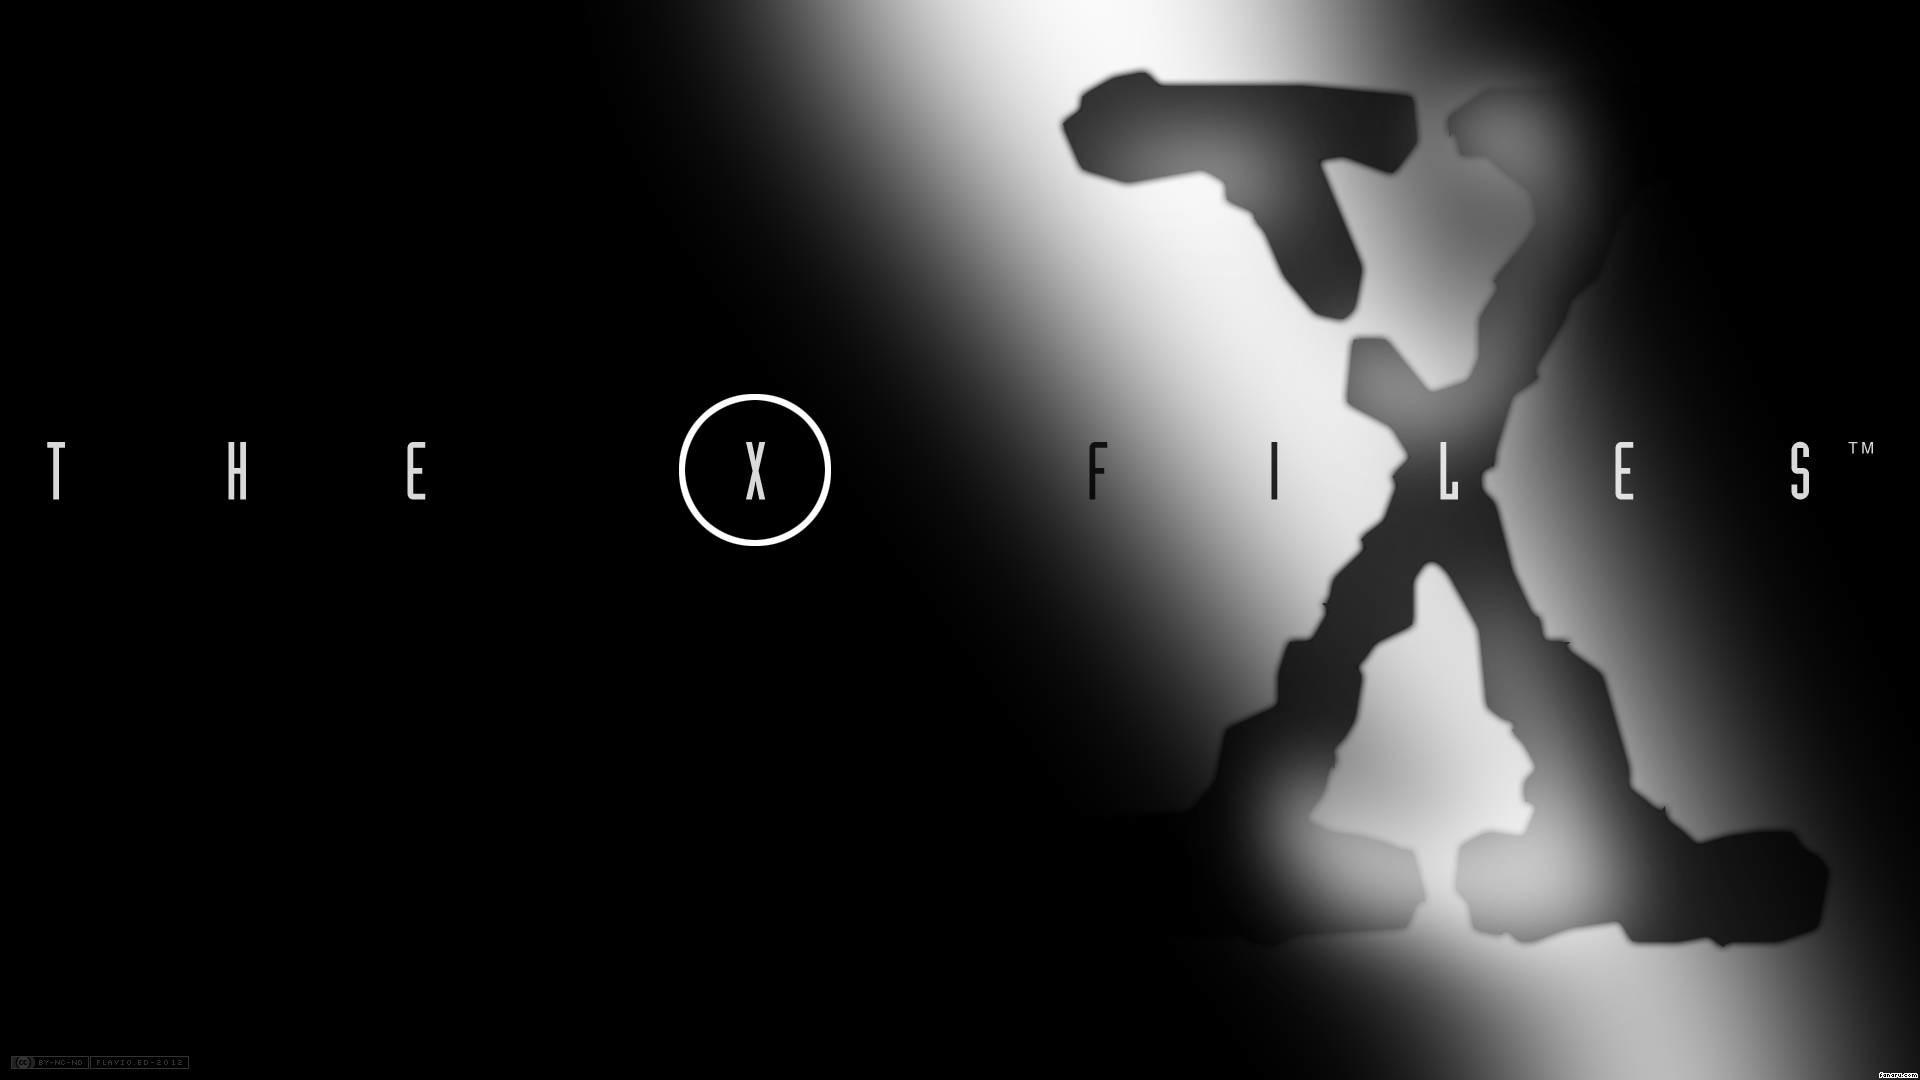 X Files Wallpaper HD (65+ images).